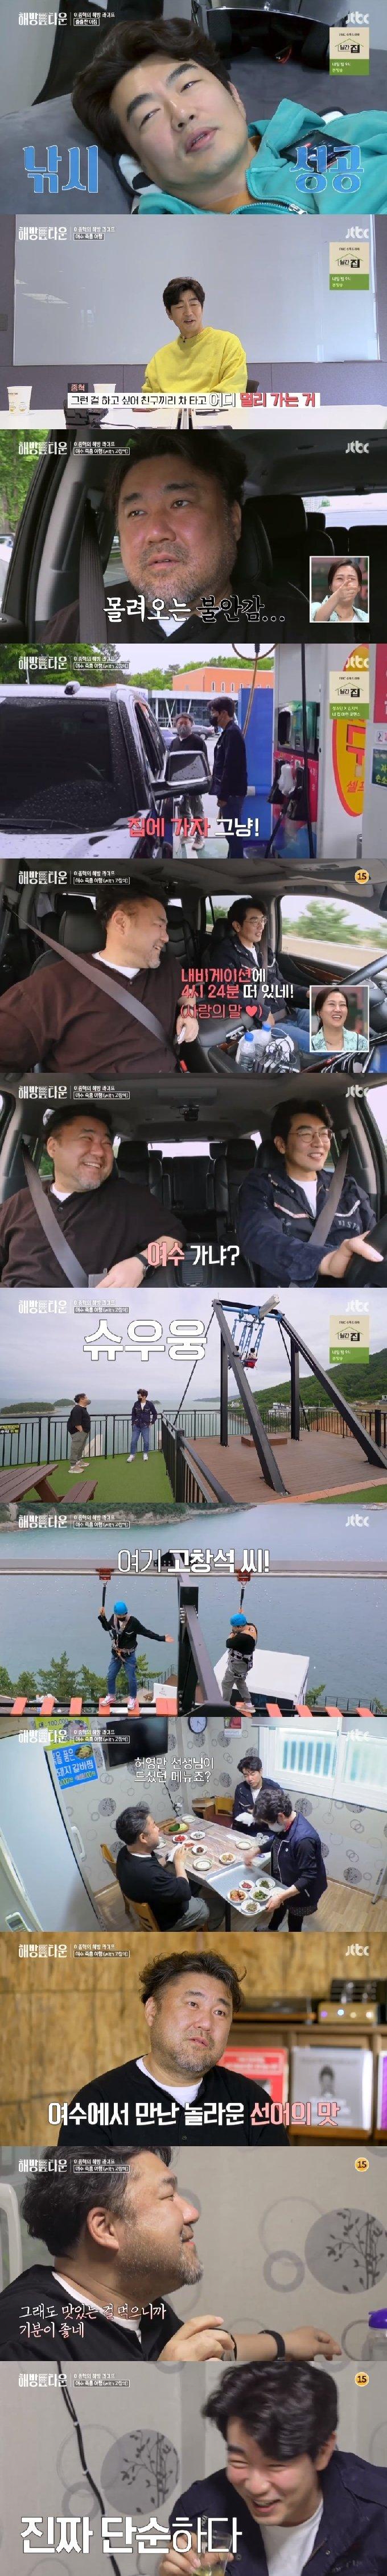 JTBC '해방타운' 캡처 © 뉴스1